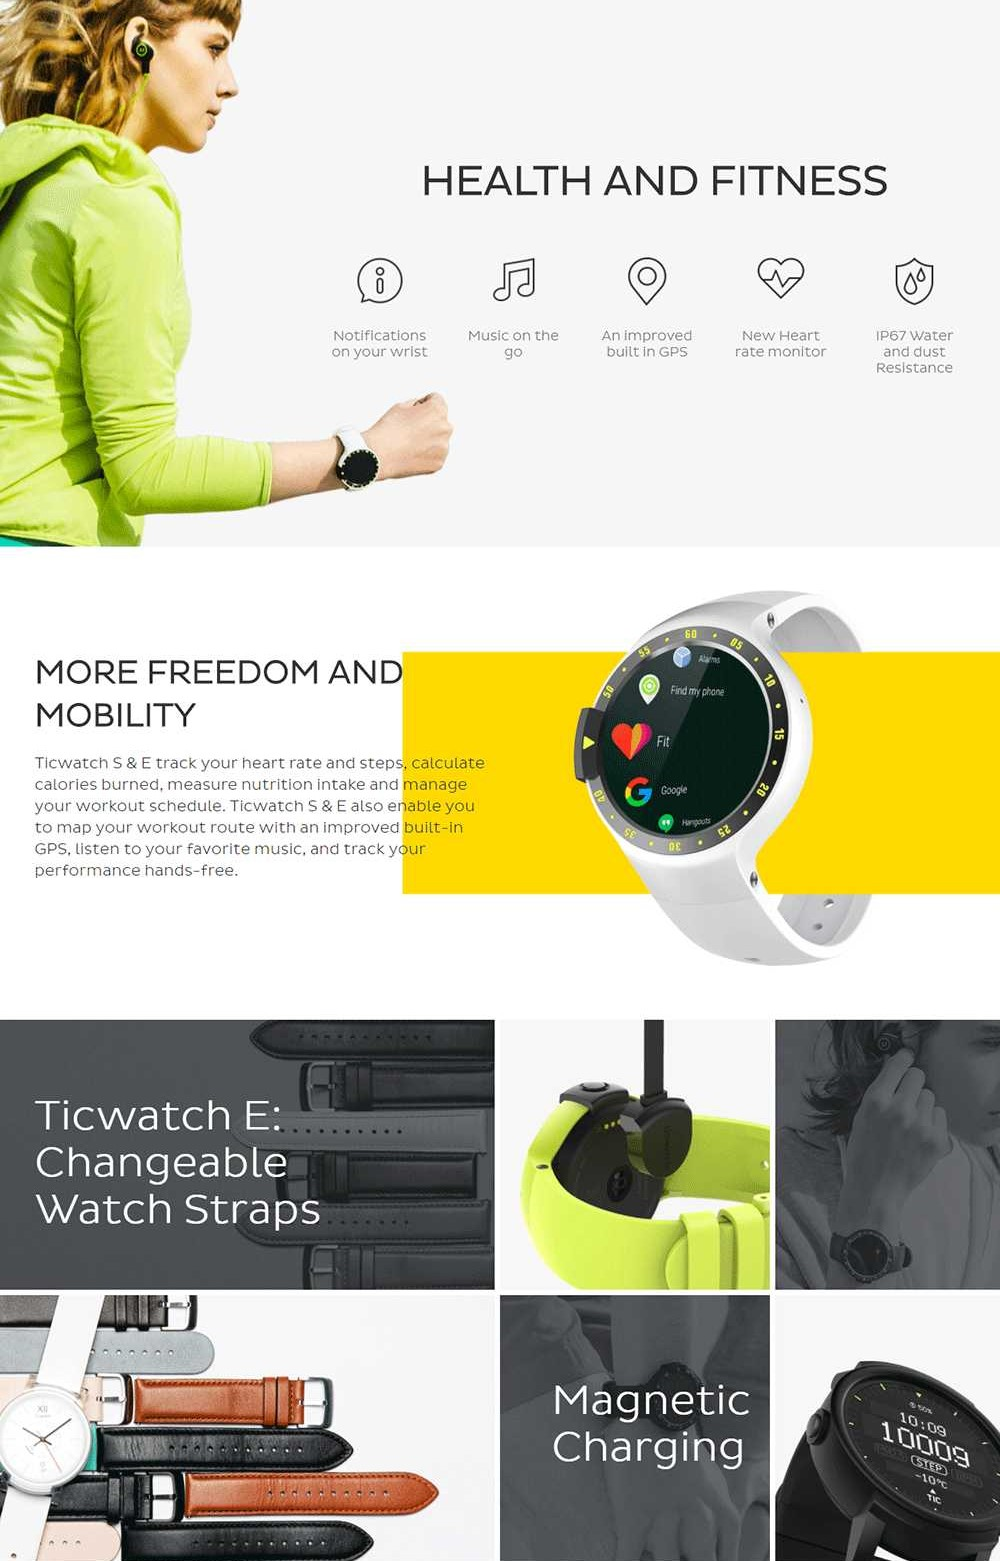 ticwatch_e_sports_3.jpg